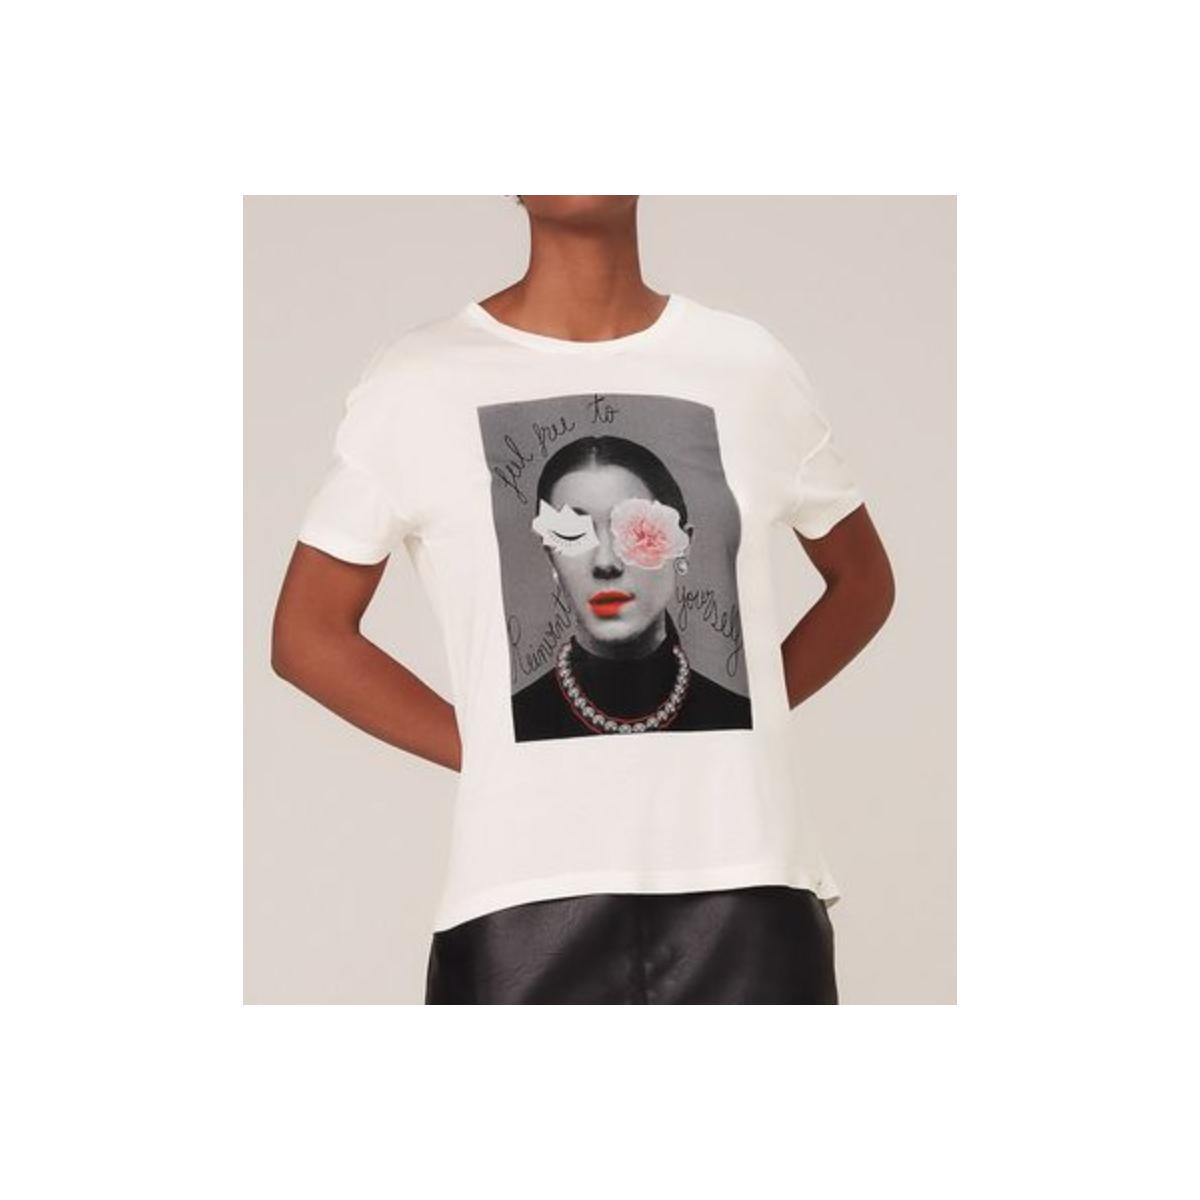 Camiseta Feminina Dzarm 6rzy Nmcen Off White